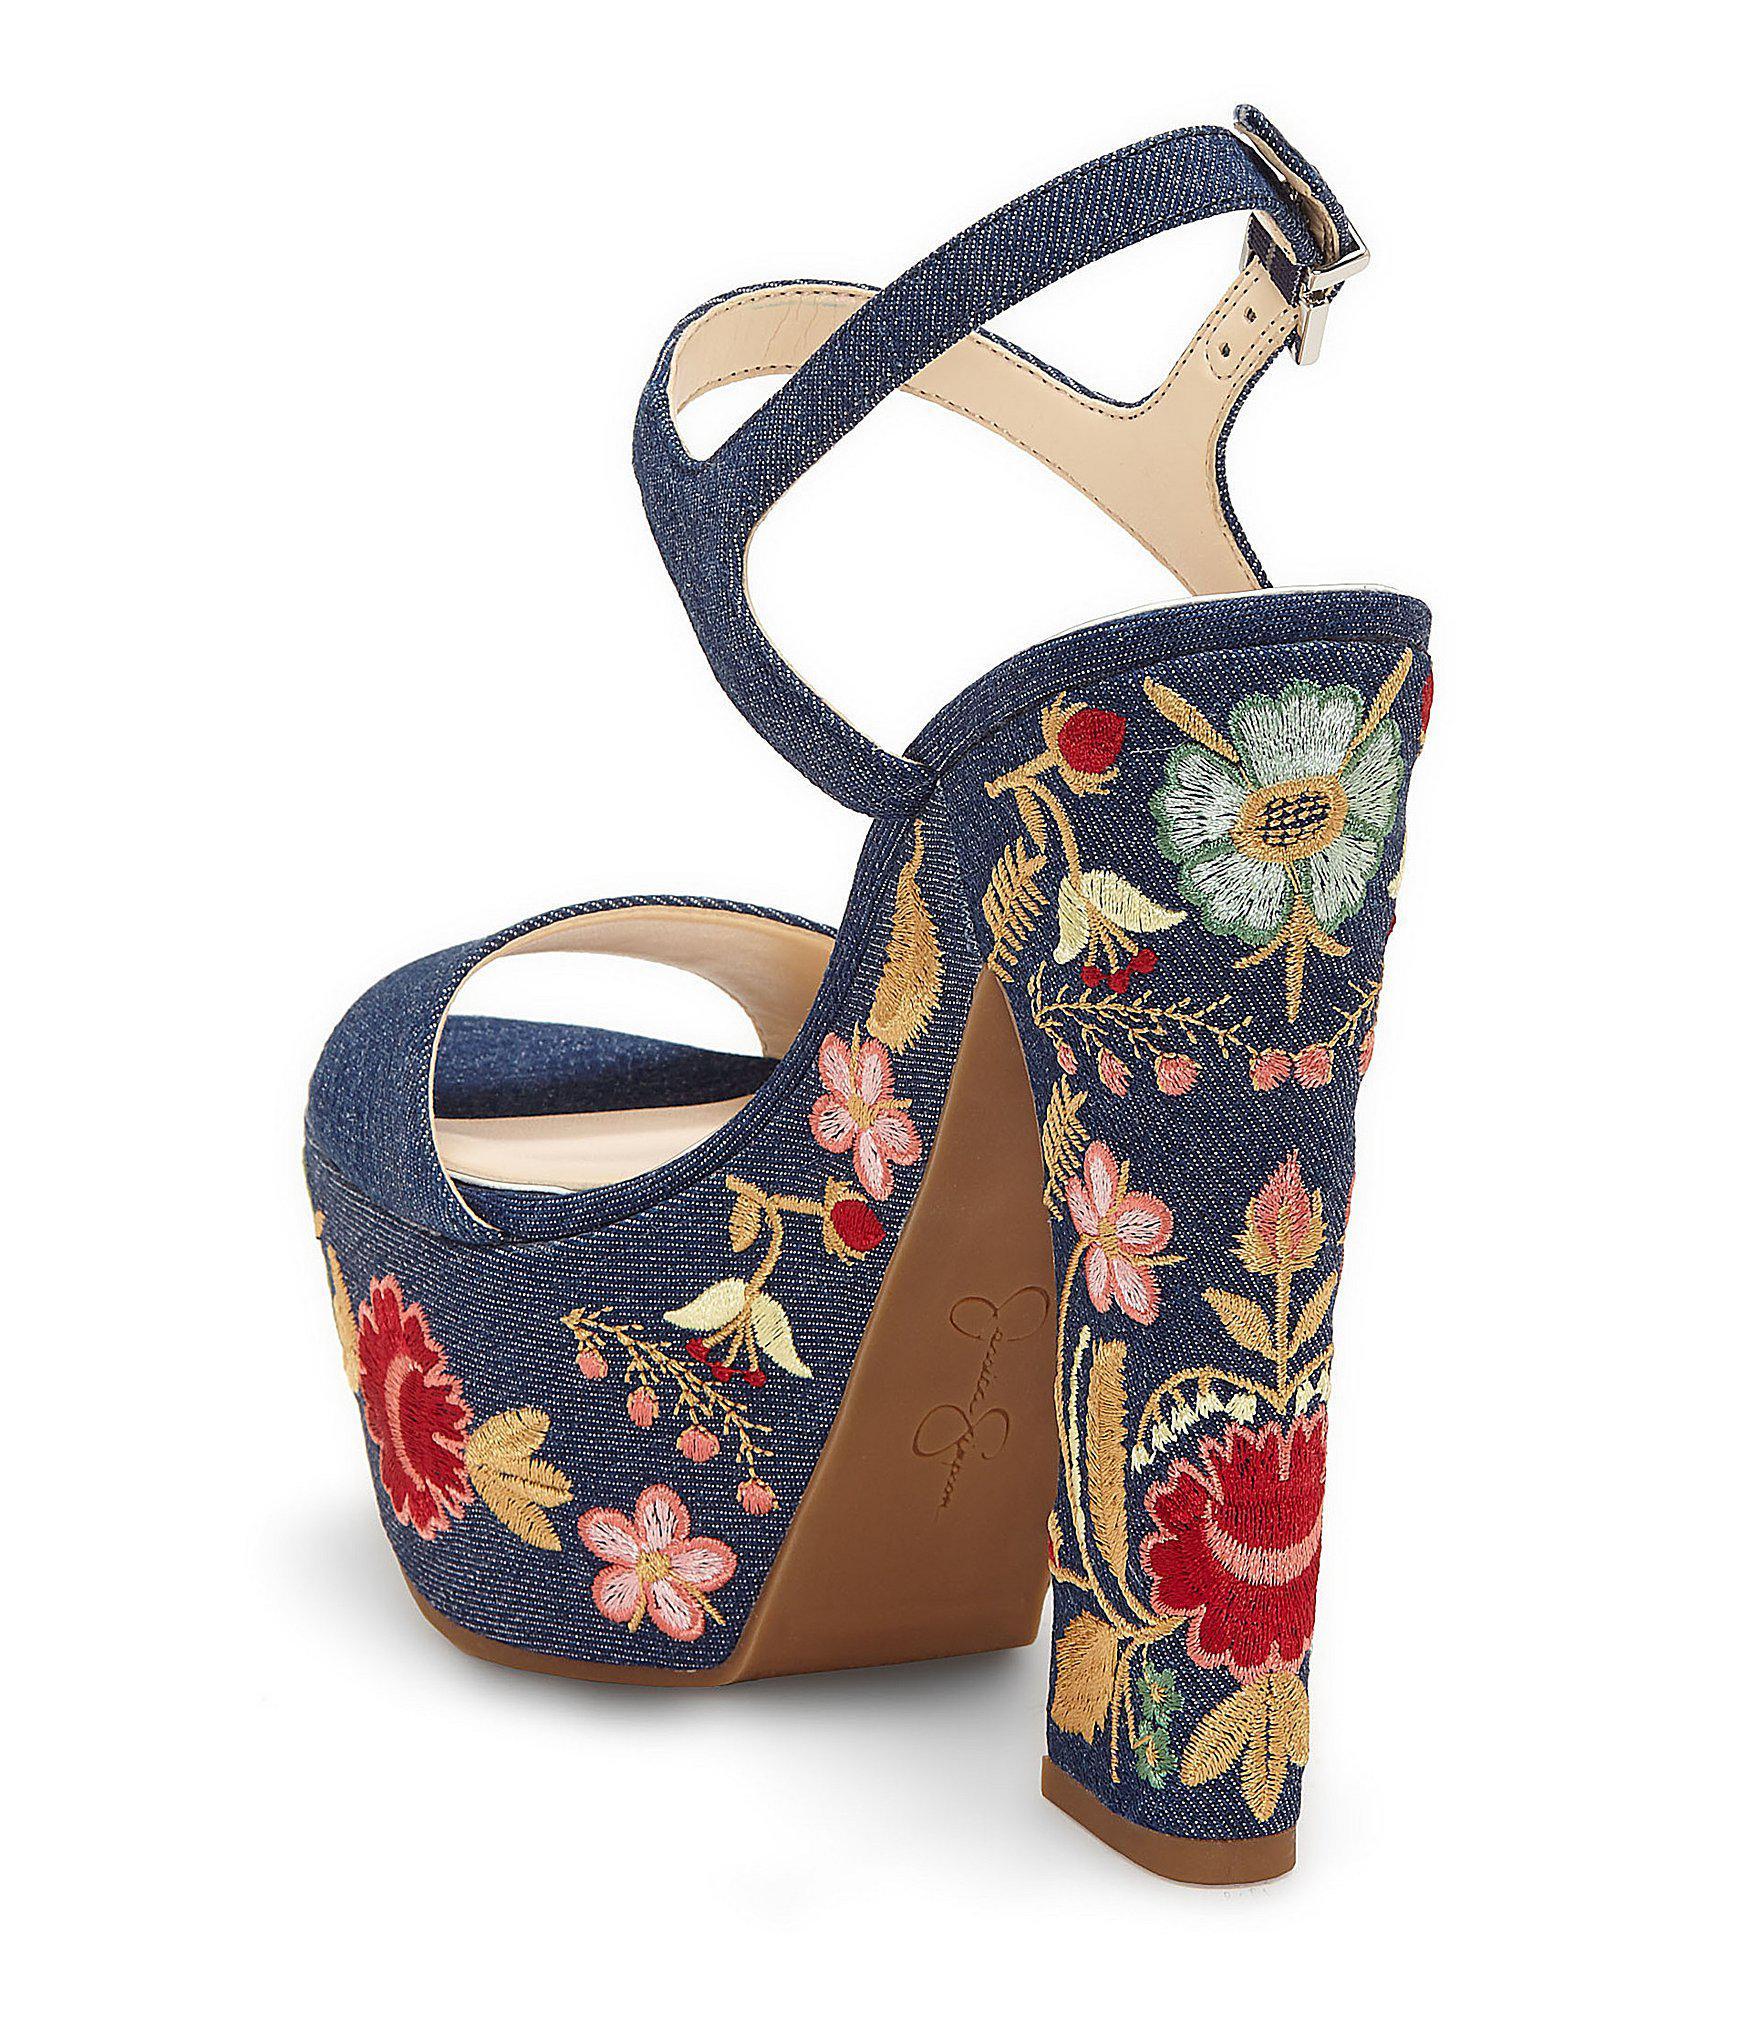 8c5ffc2b6d3 Lyst - Jessica Simpson Divella2 Denim Floral Platform Sandal in Blue